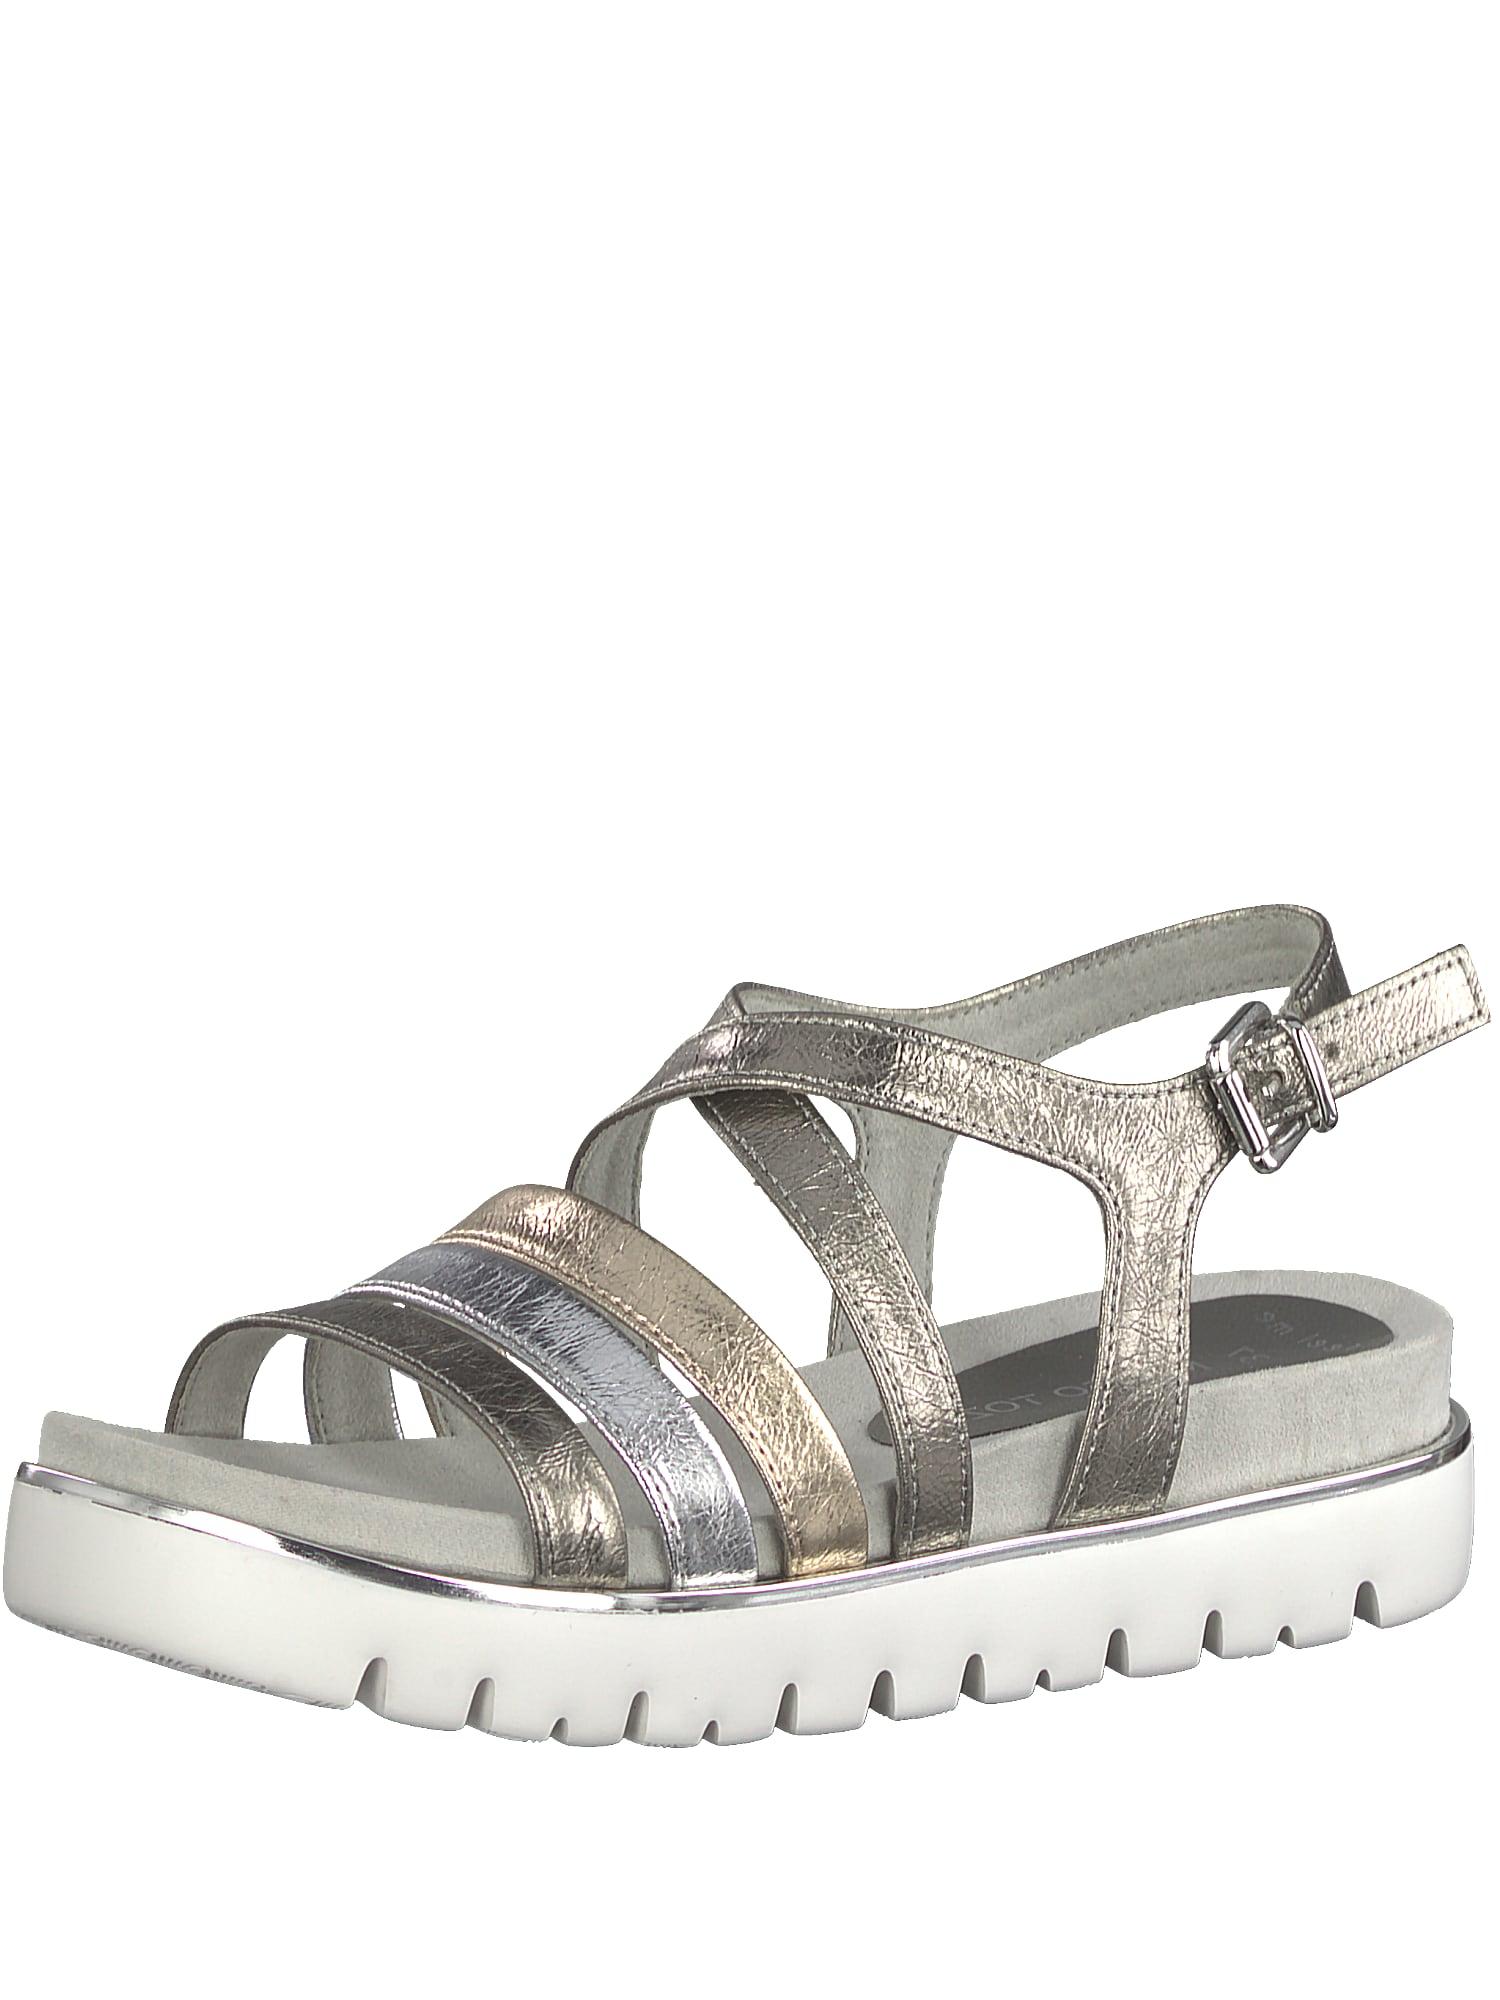 Páskové sandály zlatá šedá stříbrná bílá MARCO TOZZI